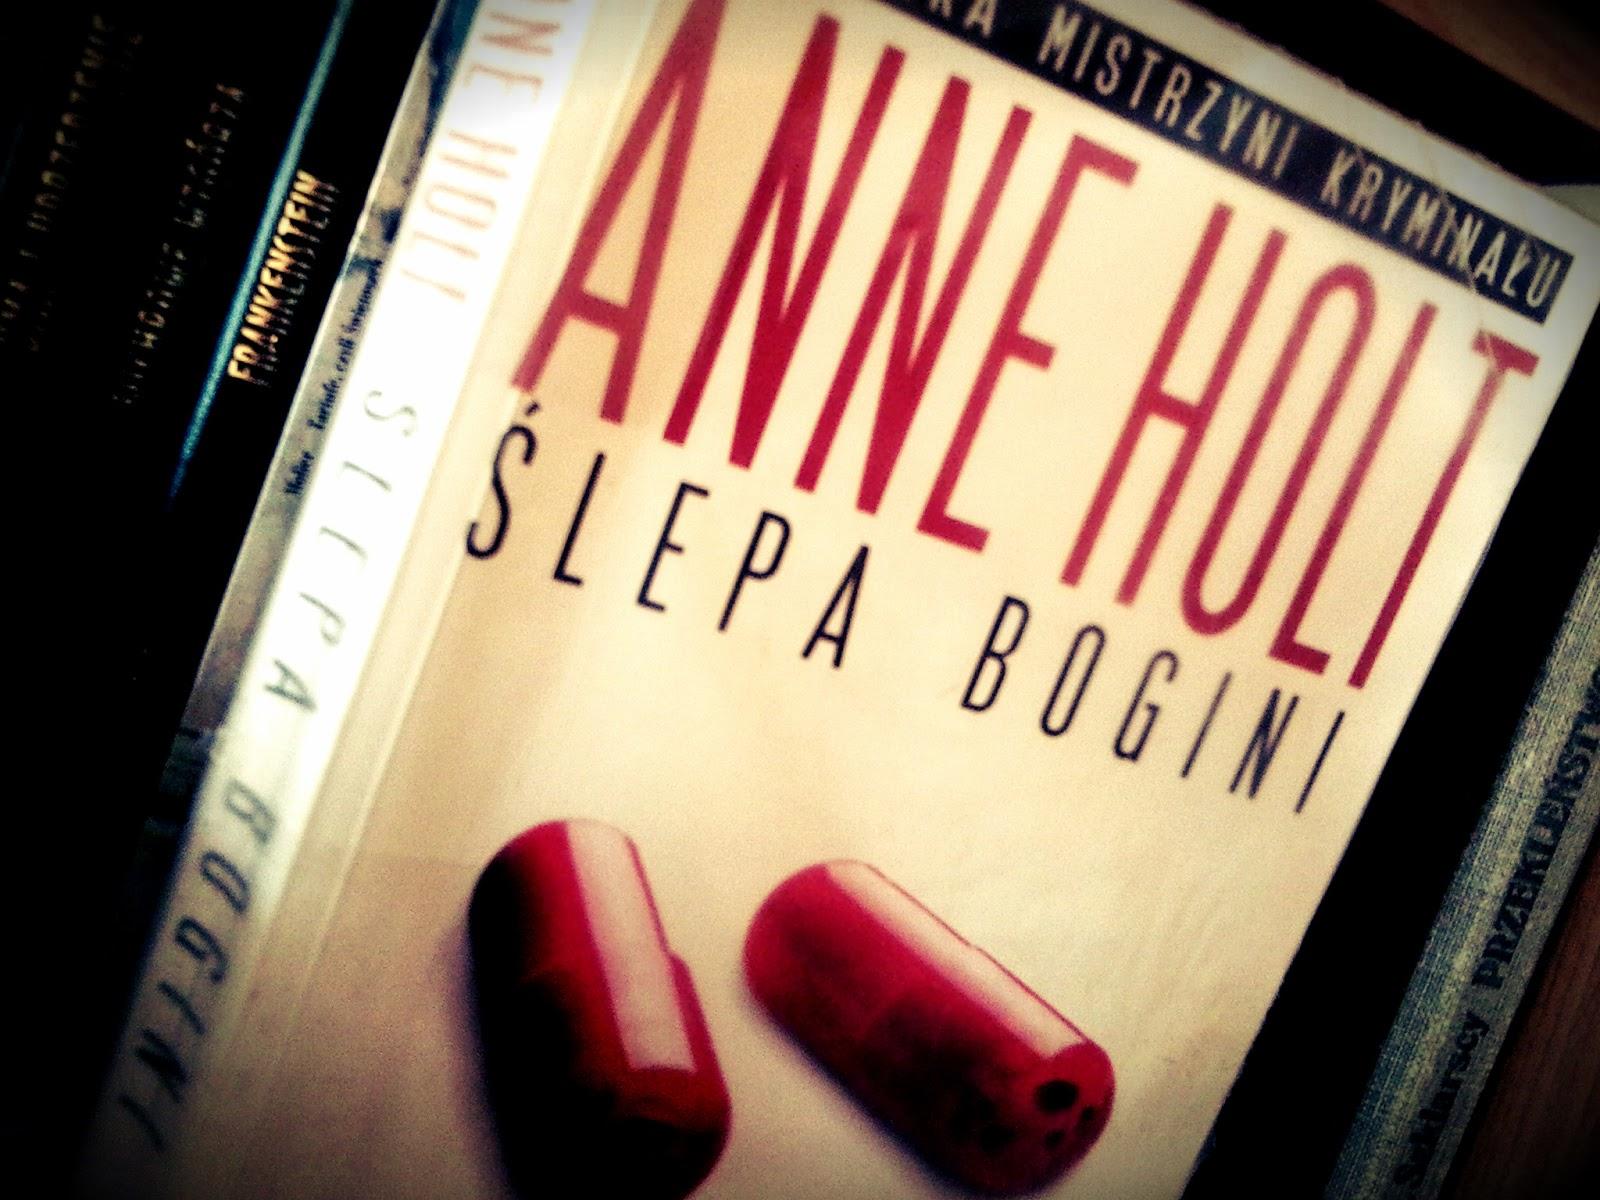 "Anne Holt ""Ślepa bogini"""